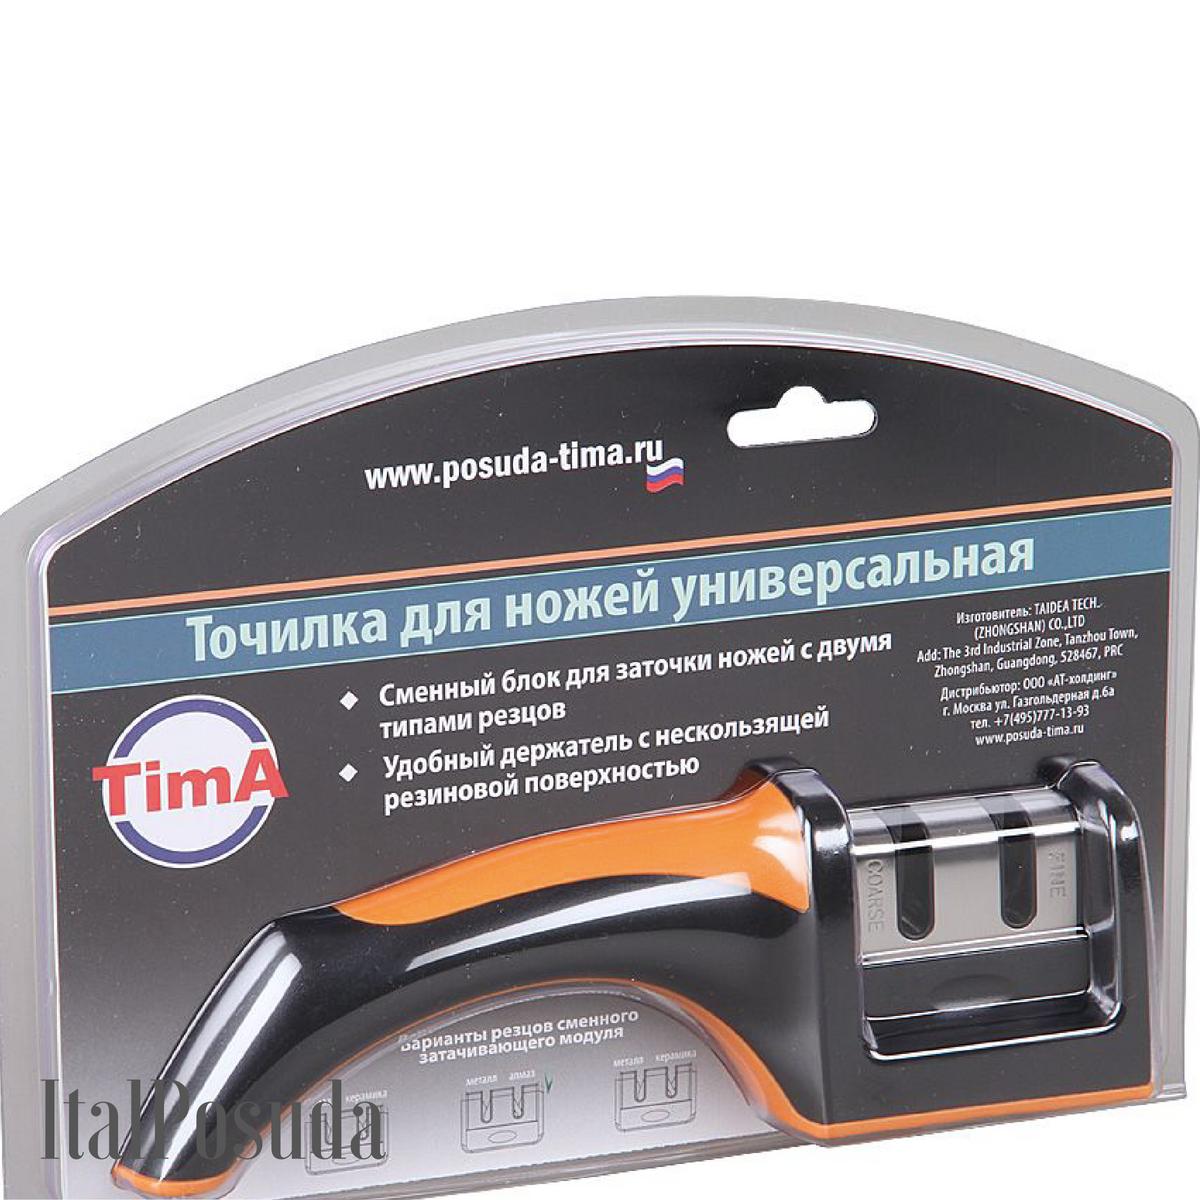 Точилка роликовая TIMA ТМА-002